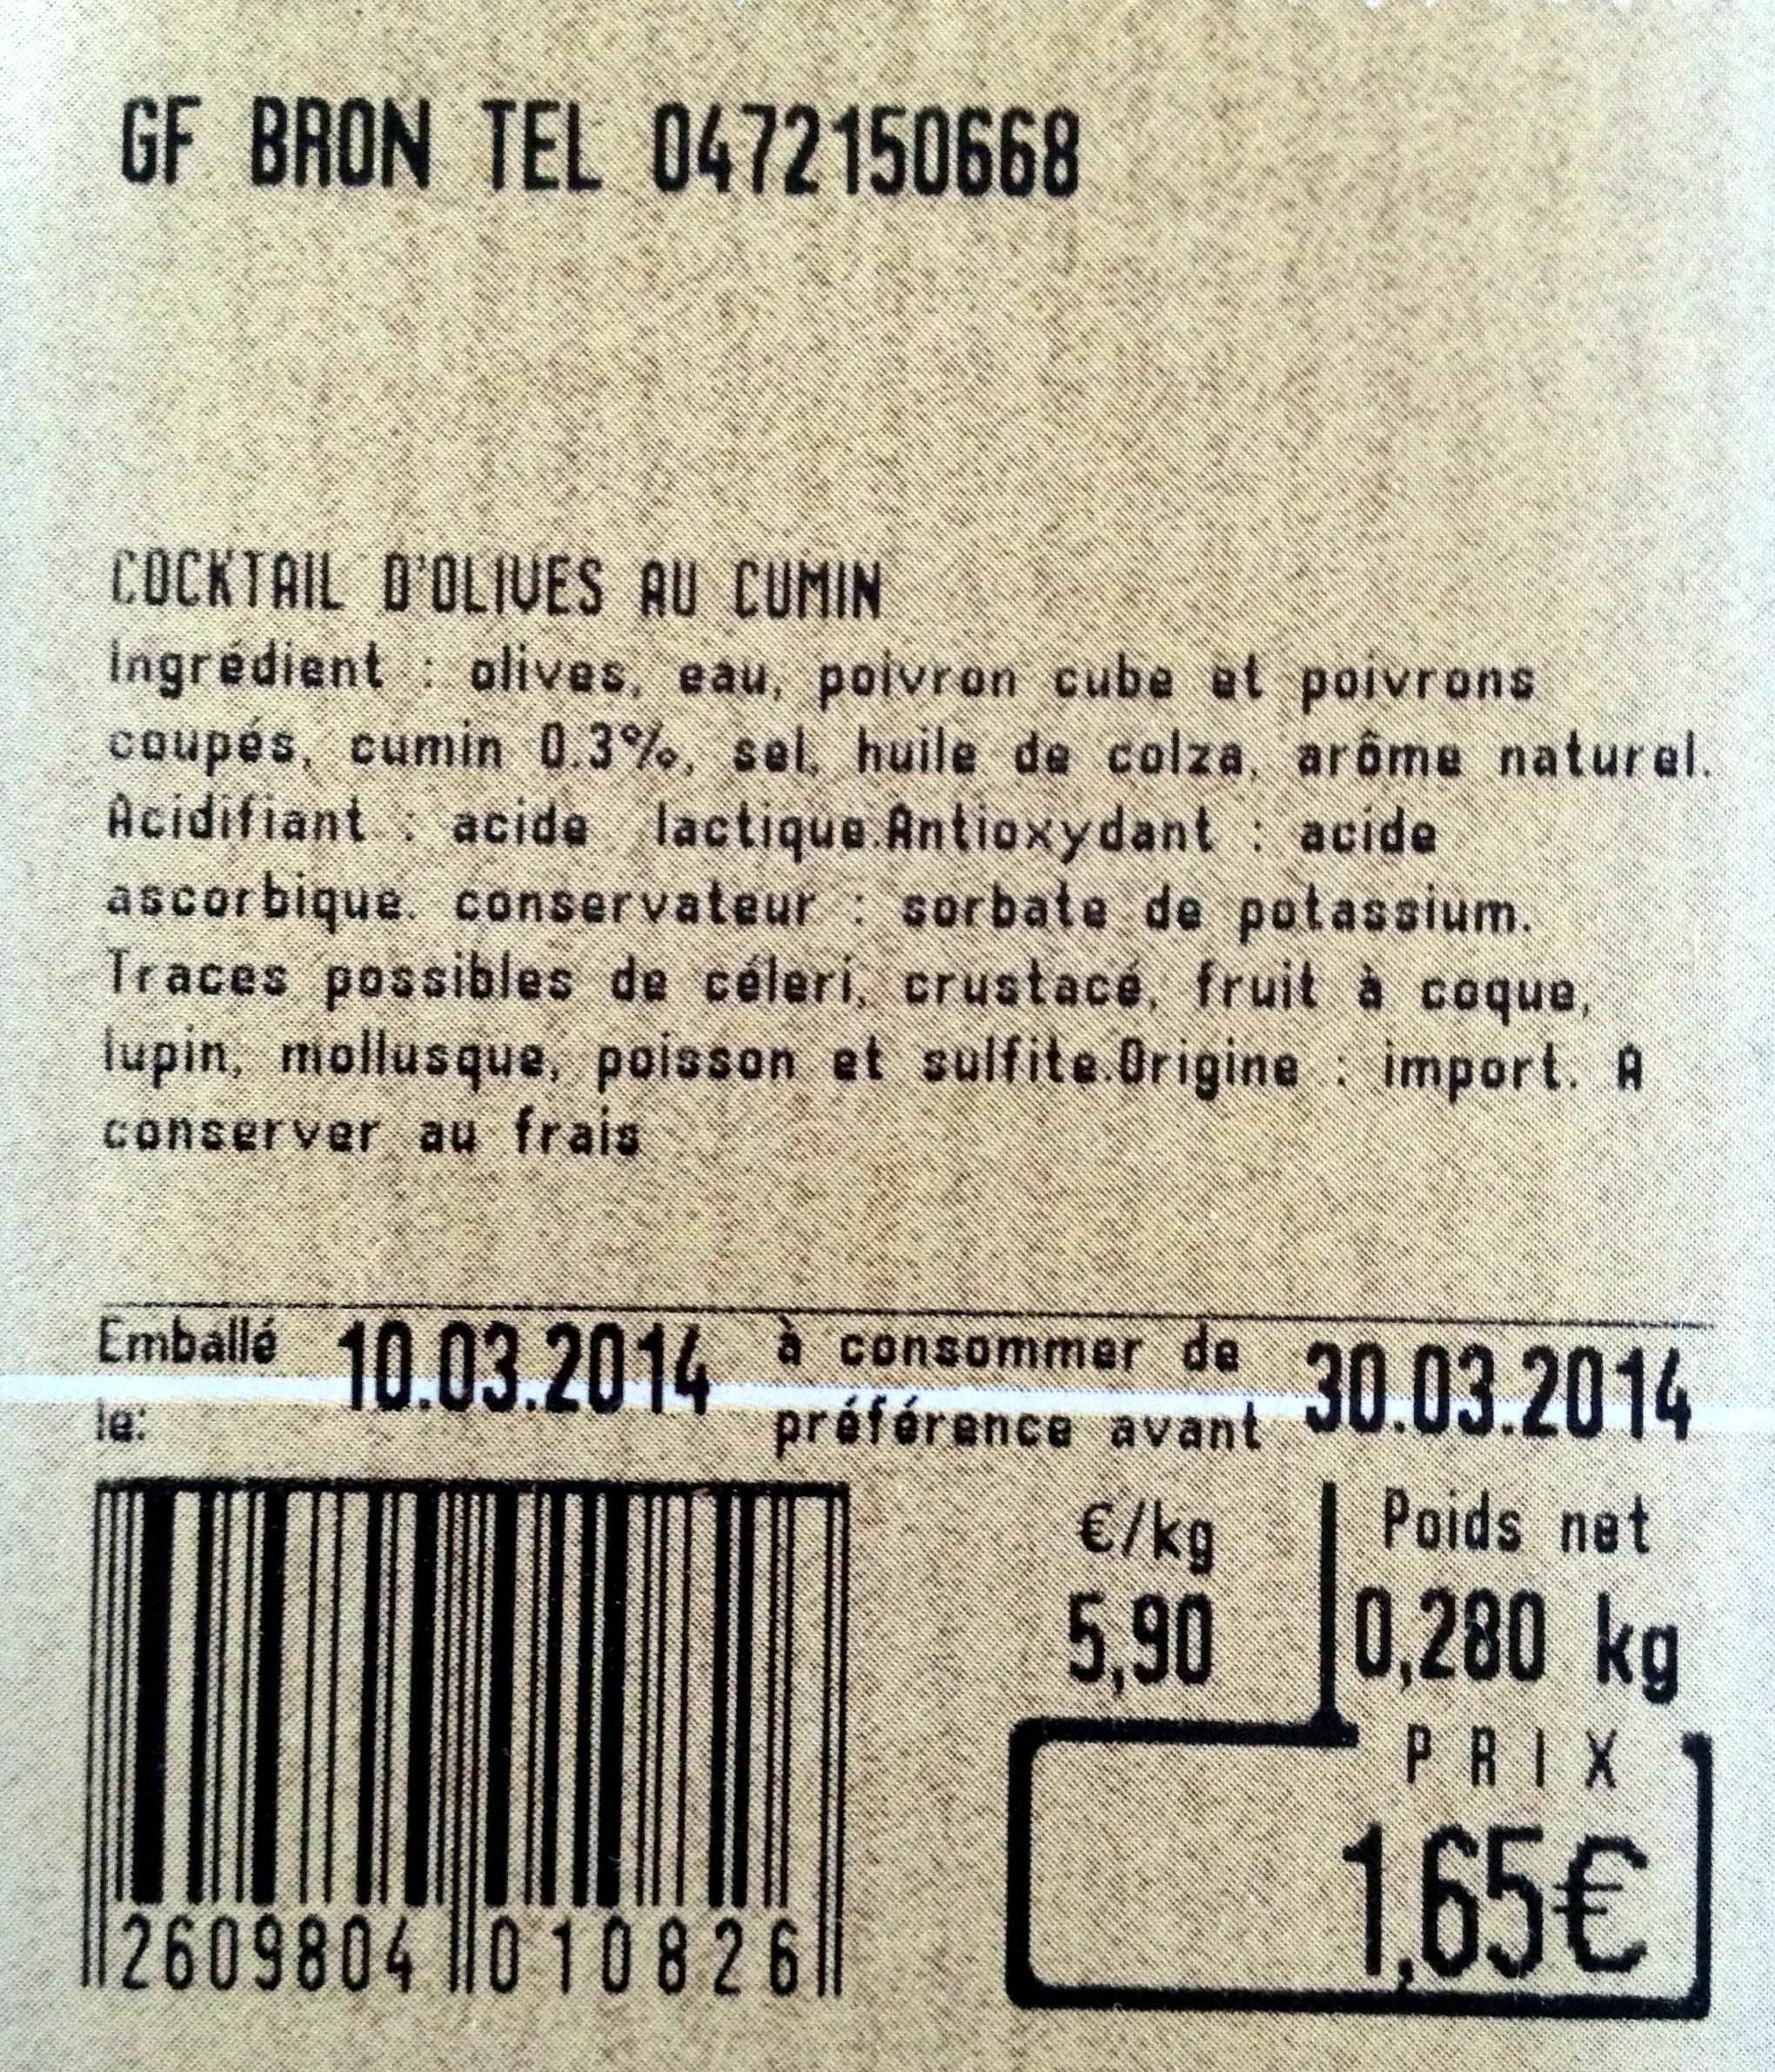 Cocktail d'olives au cumin - Product - fr